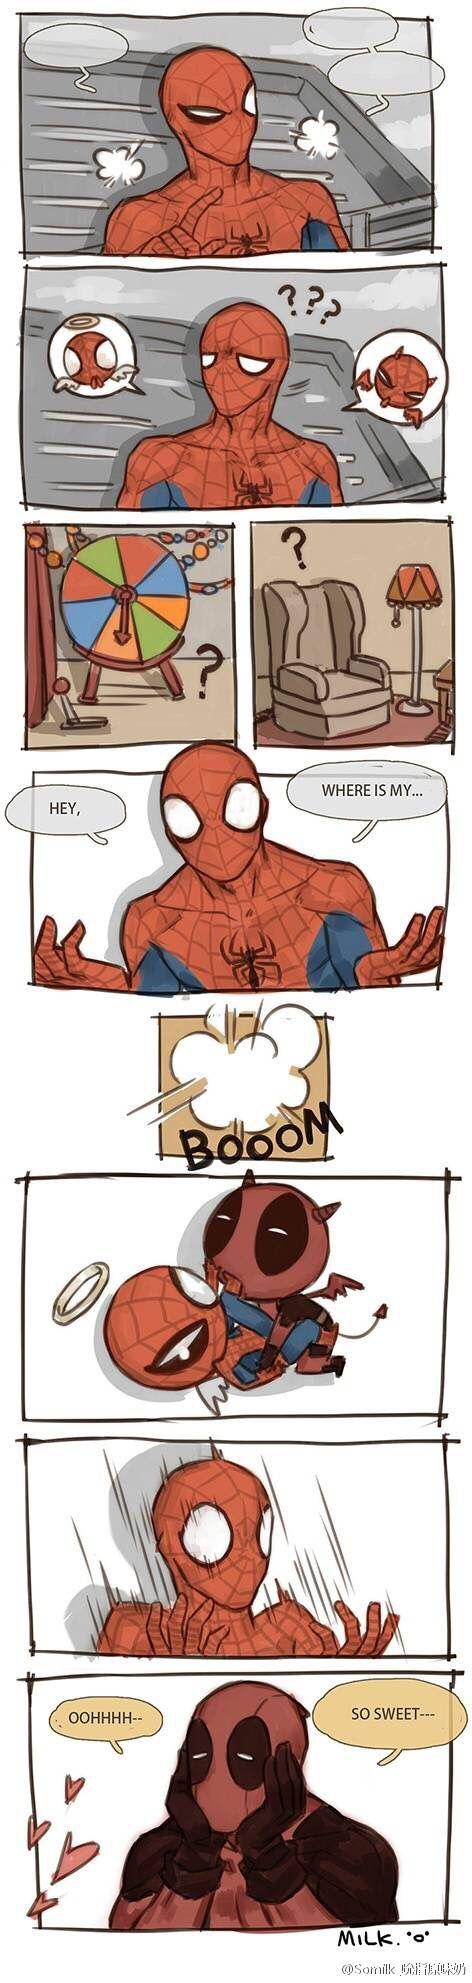 Deadpool x Spiderman @Somilk_吮指原味奶 - visit to grab an unforgettable cool 3D…